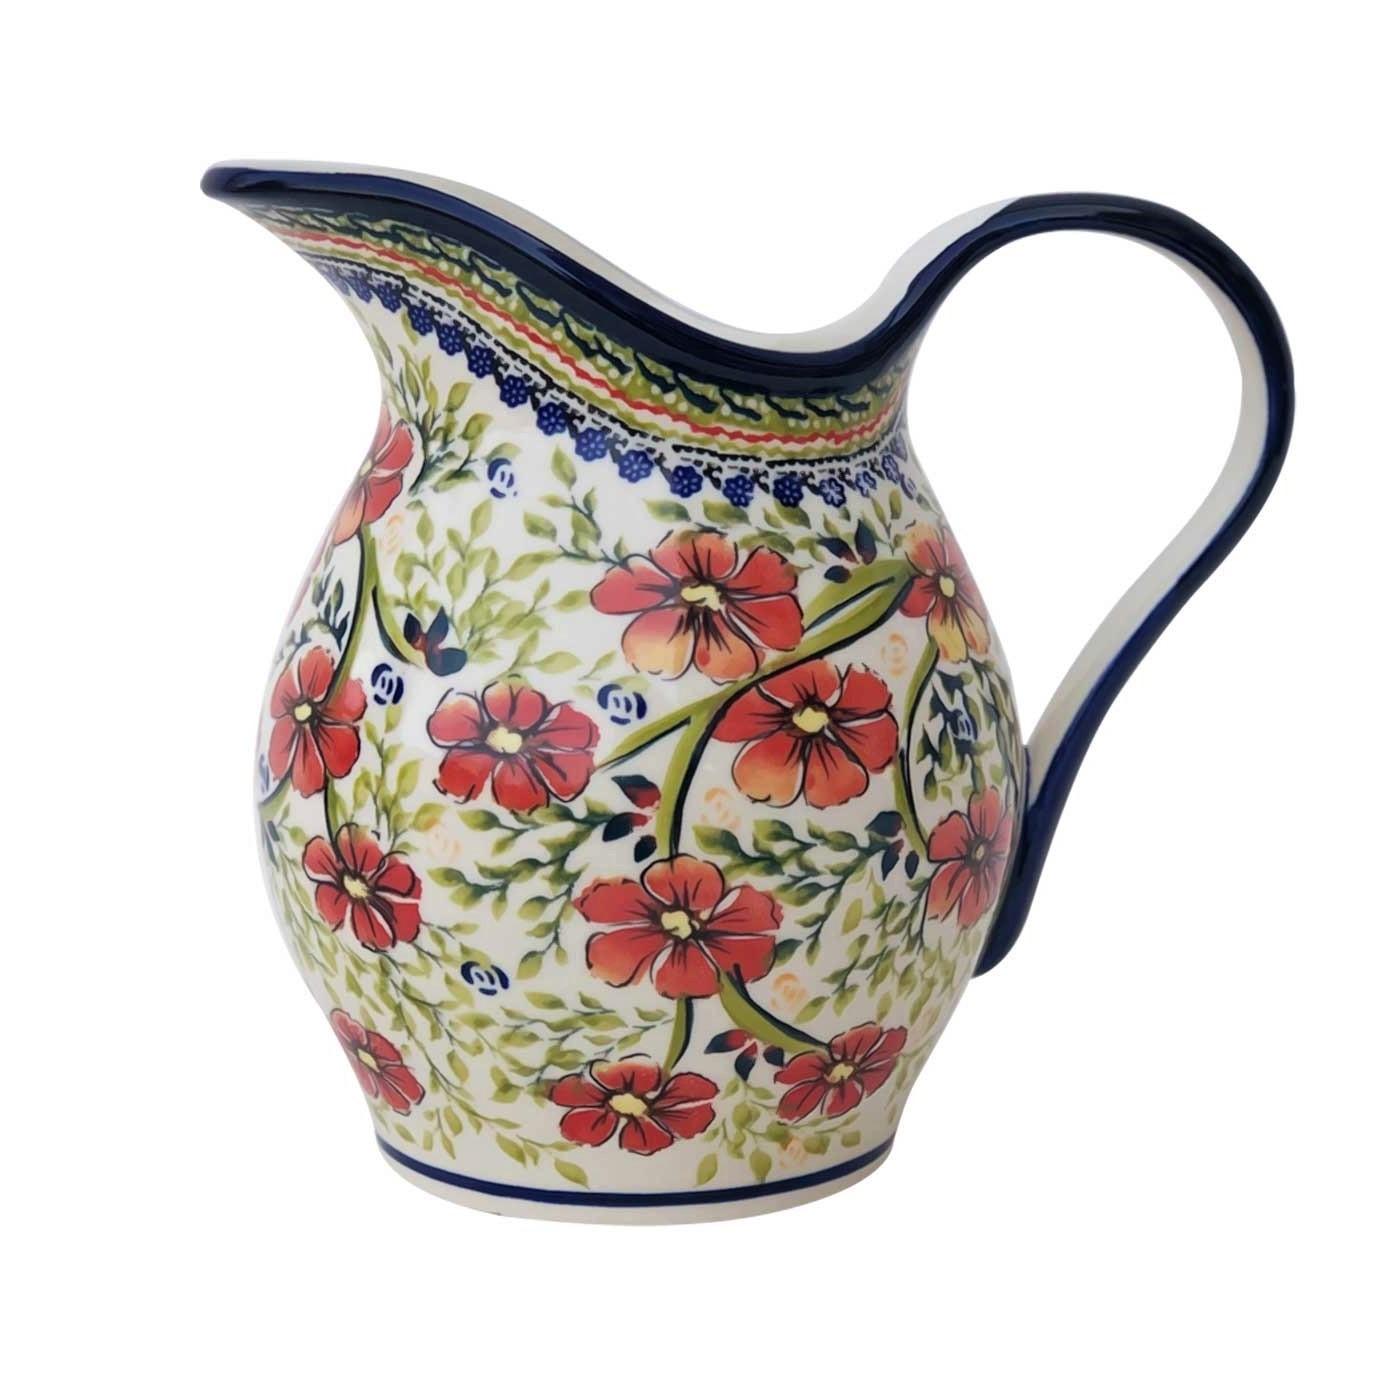 Pottery Avenue Love Blossoms 2qt Stoneware Pitcher - 1160-252EX